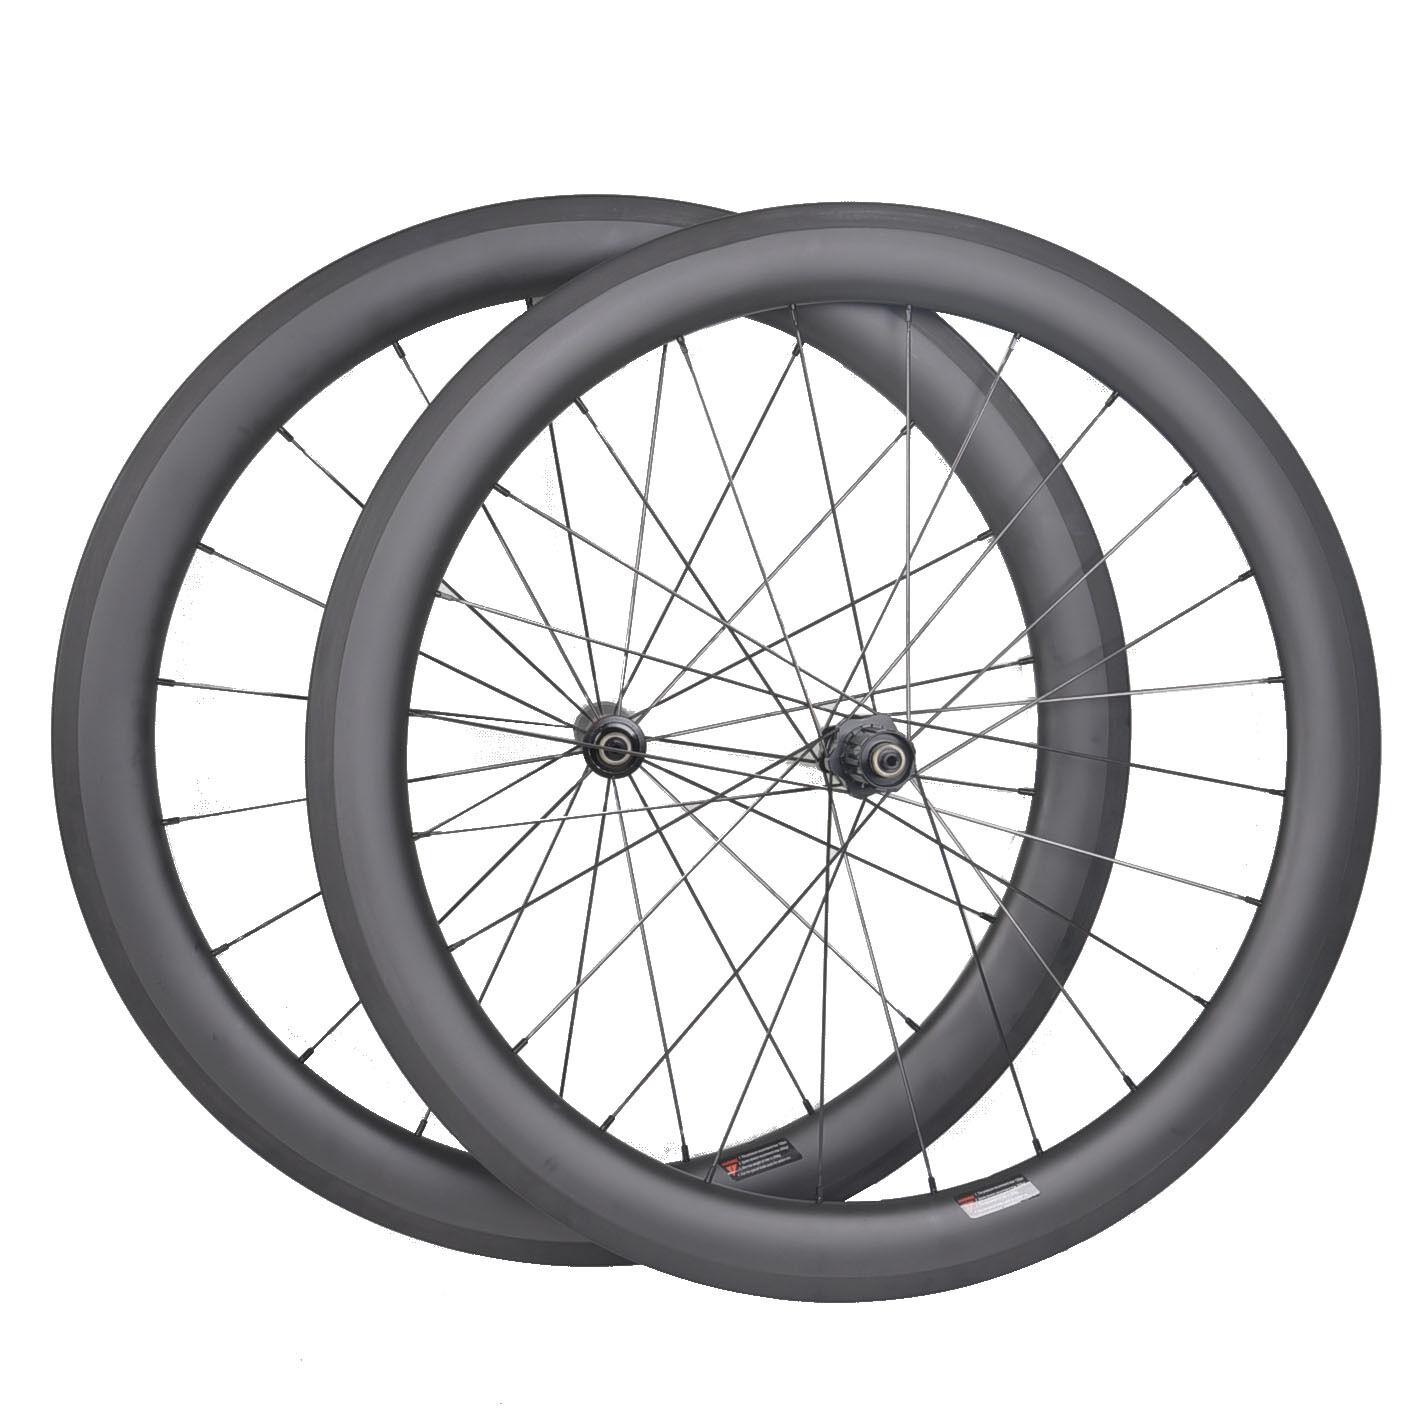 DT Swiss 350 Wheel Sapim Carbon Clincher 50mm UD Matt Road Bicycle Rim 25mm 700C